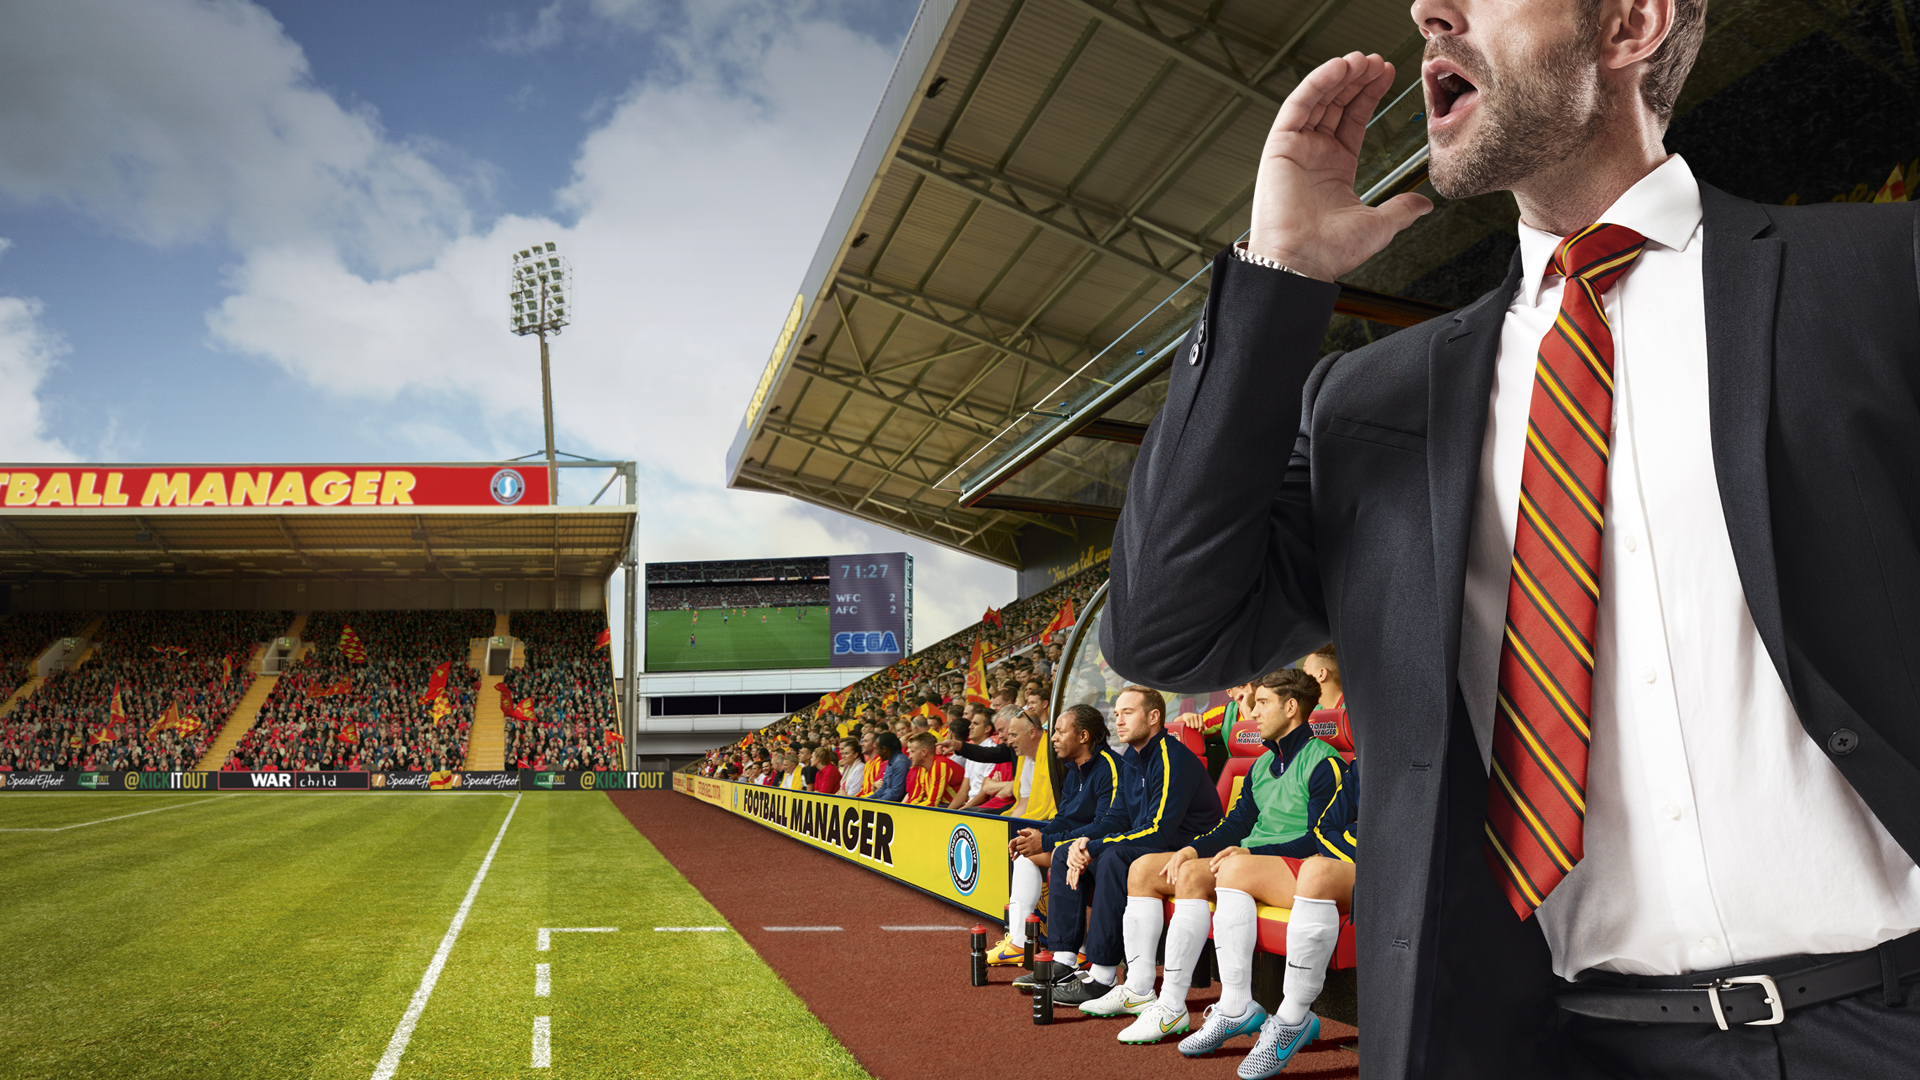 Анонсирована Football Manager 2019. Разработчики обещают небывалый реализм